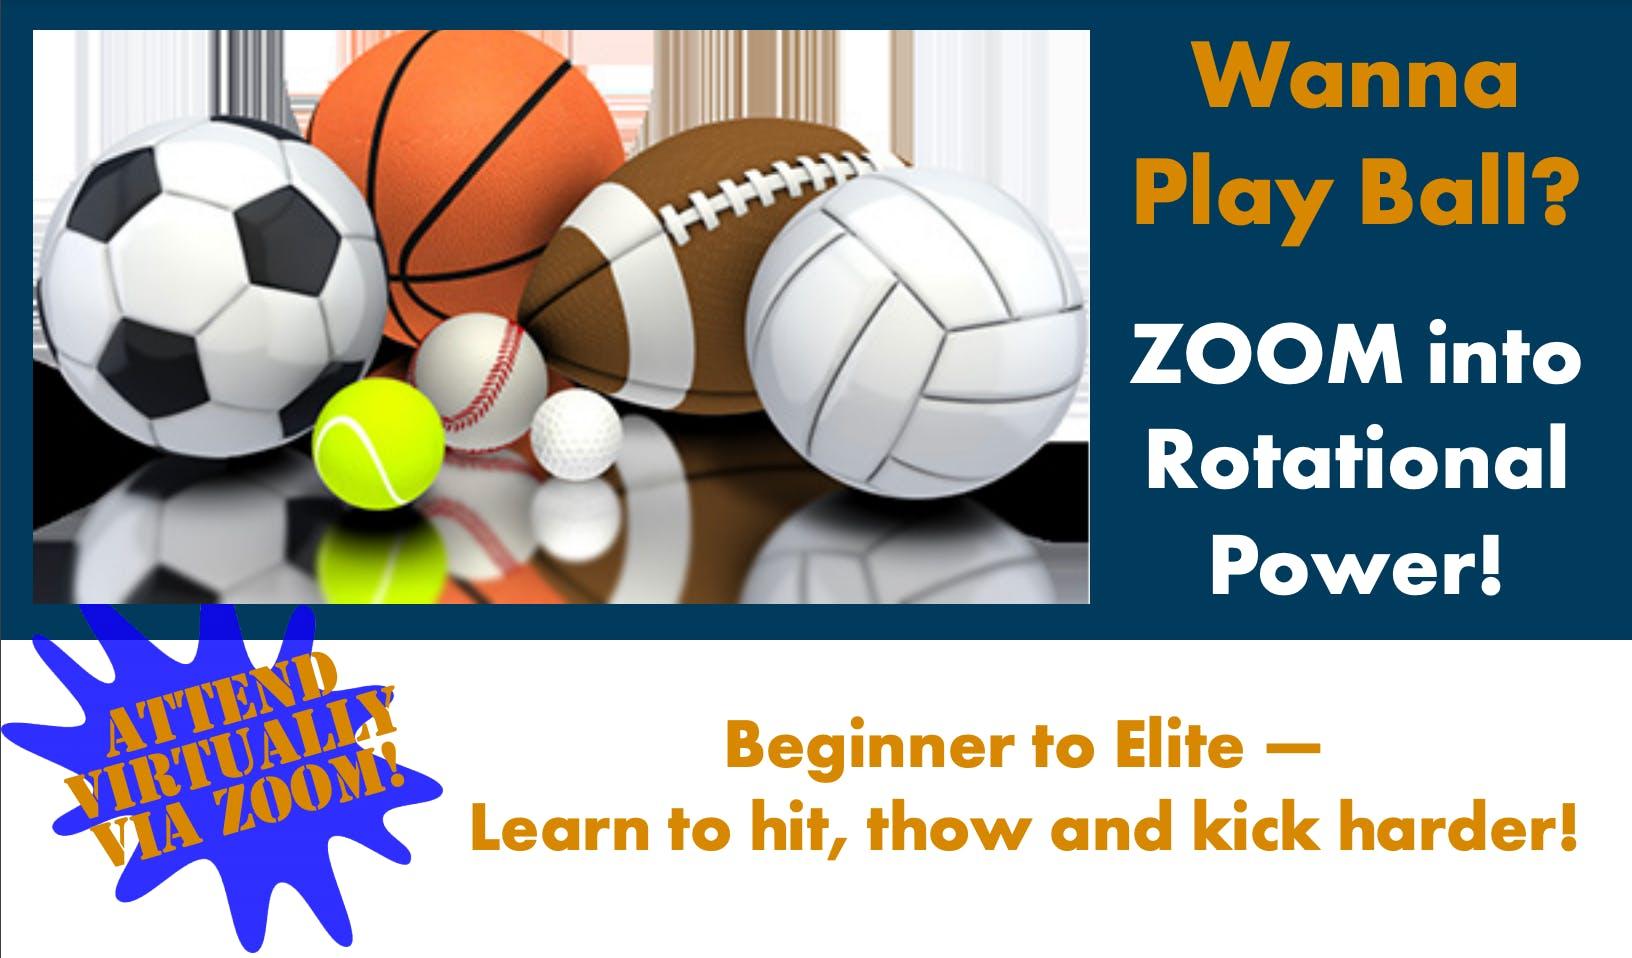 Wanna Play Ball | Zoom into Rotational Power! | Attend Virtually Via Zoom